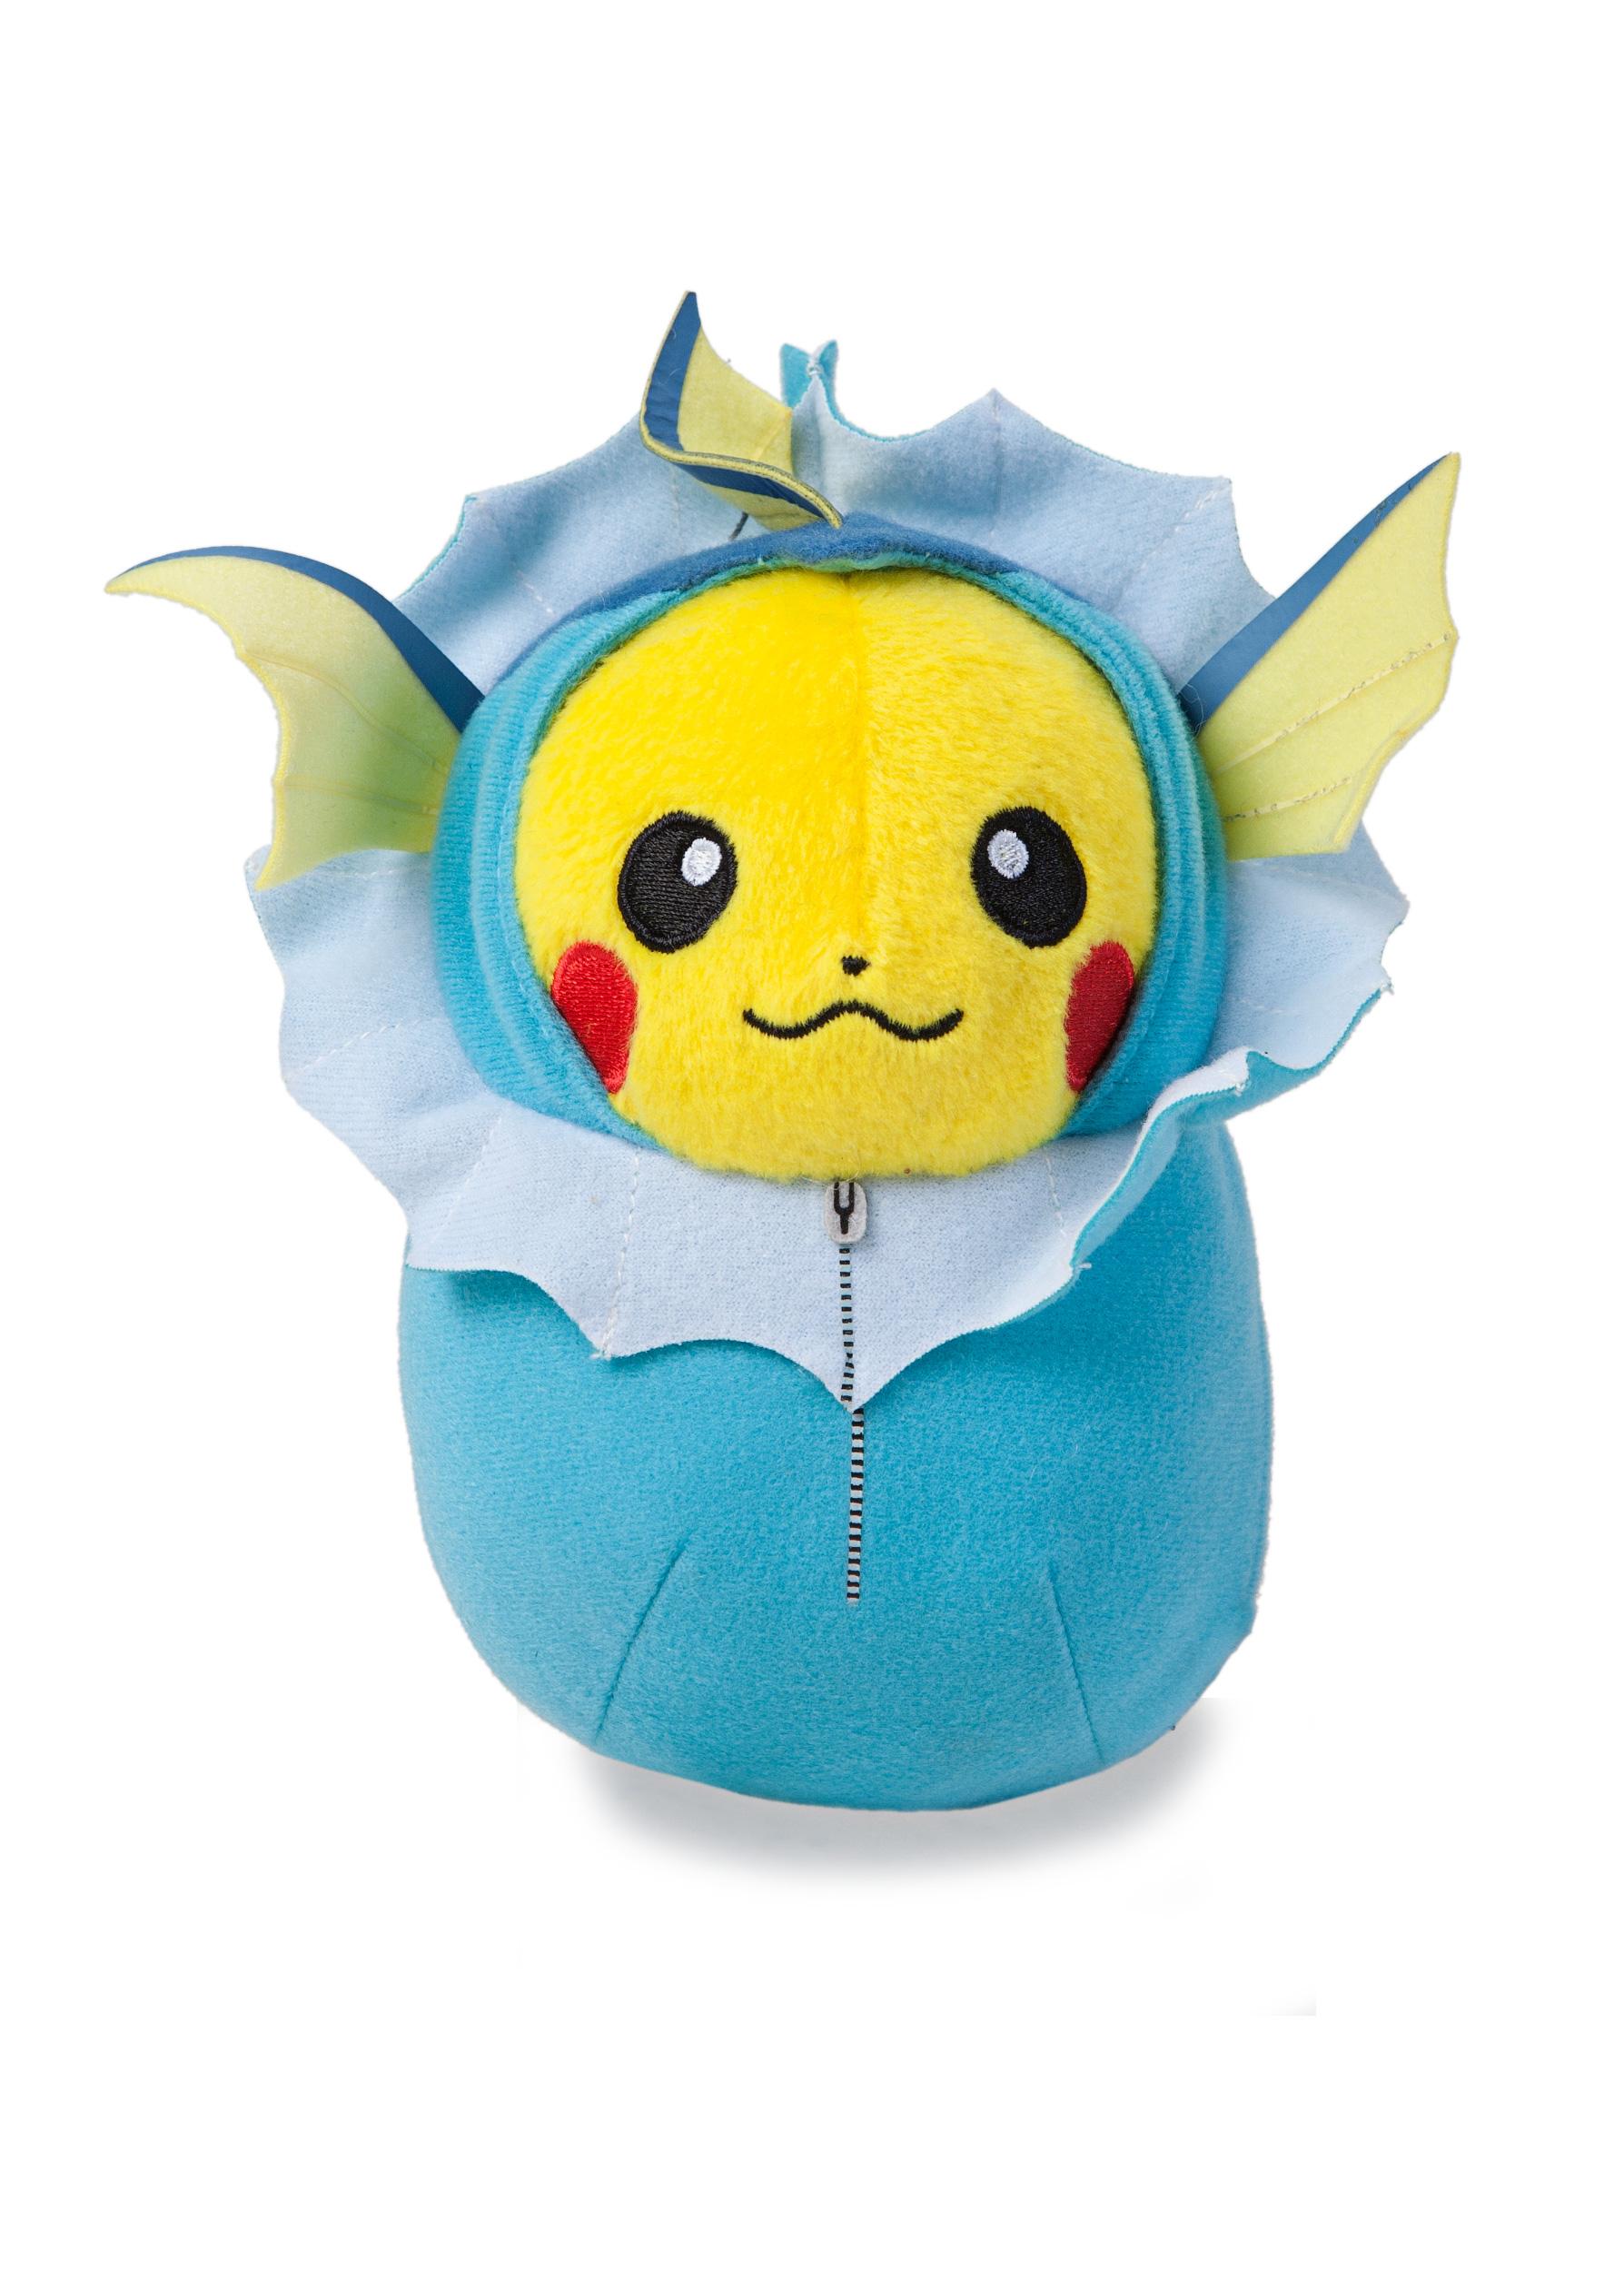 Pokemon Pikachu in Vaporeon Sleeping Bag 13 cm Nebukuro Collection Plush Toy